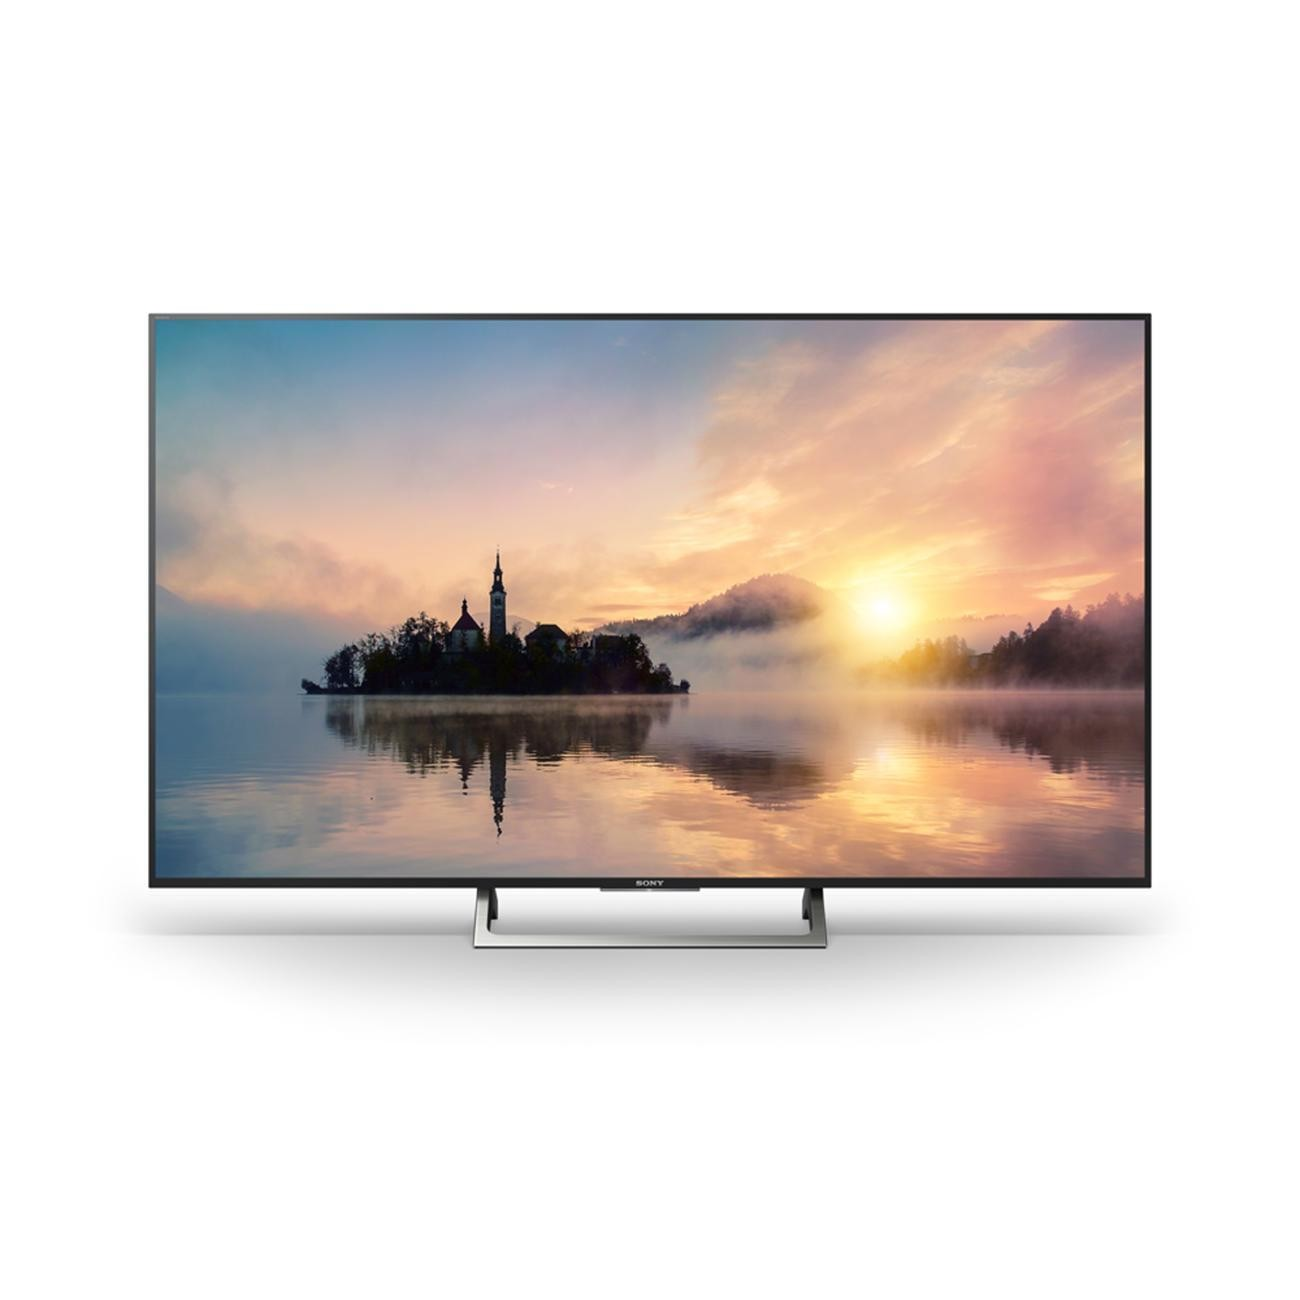 54917aa8acc2f Sony 49 Inch 4K Ultra HD HDR Smart TV - Electronics